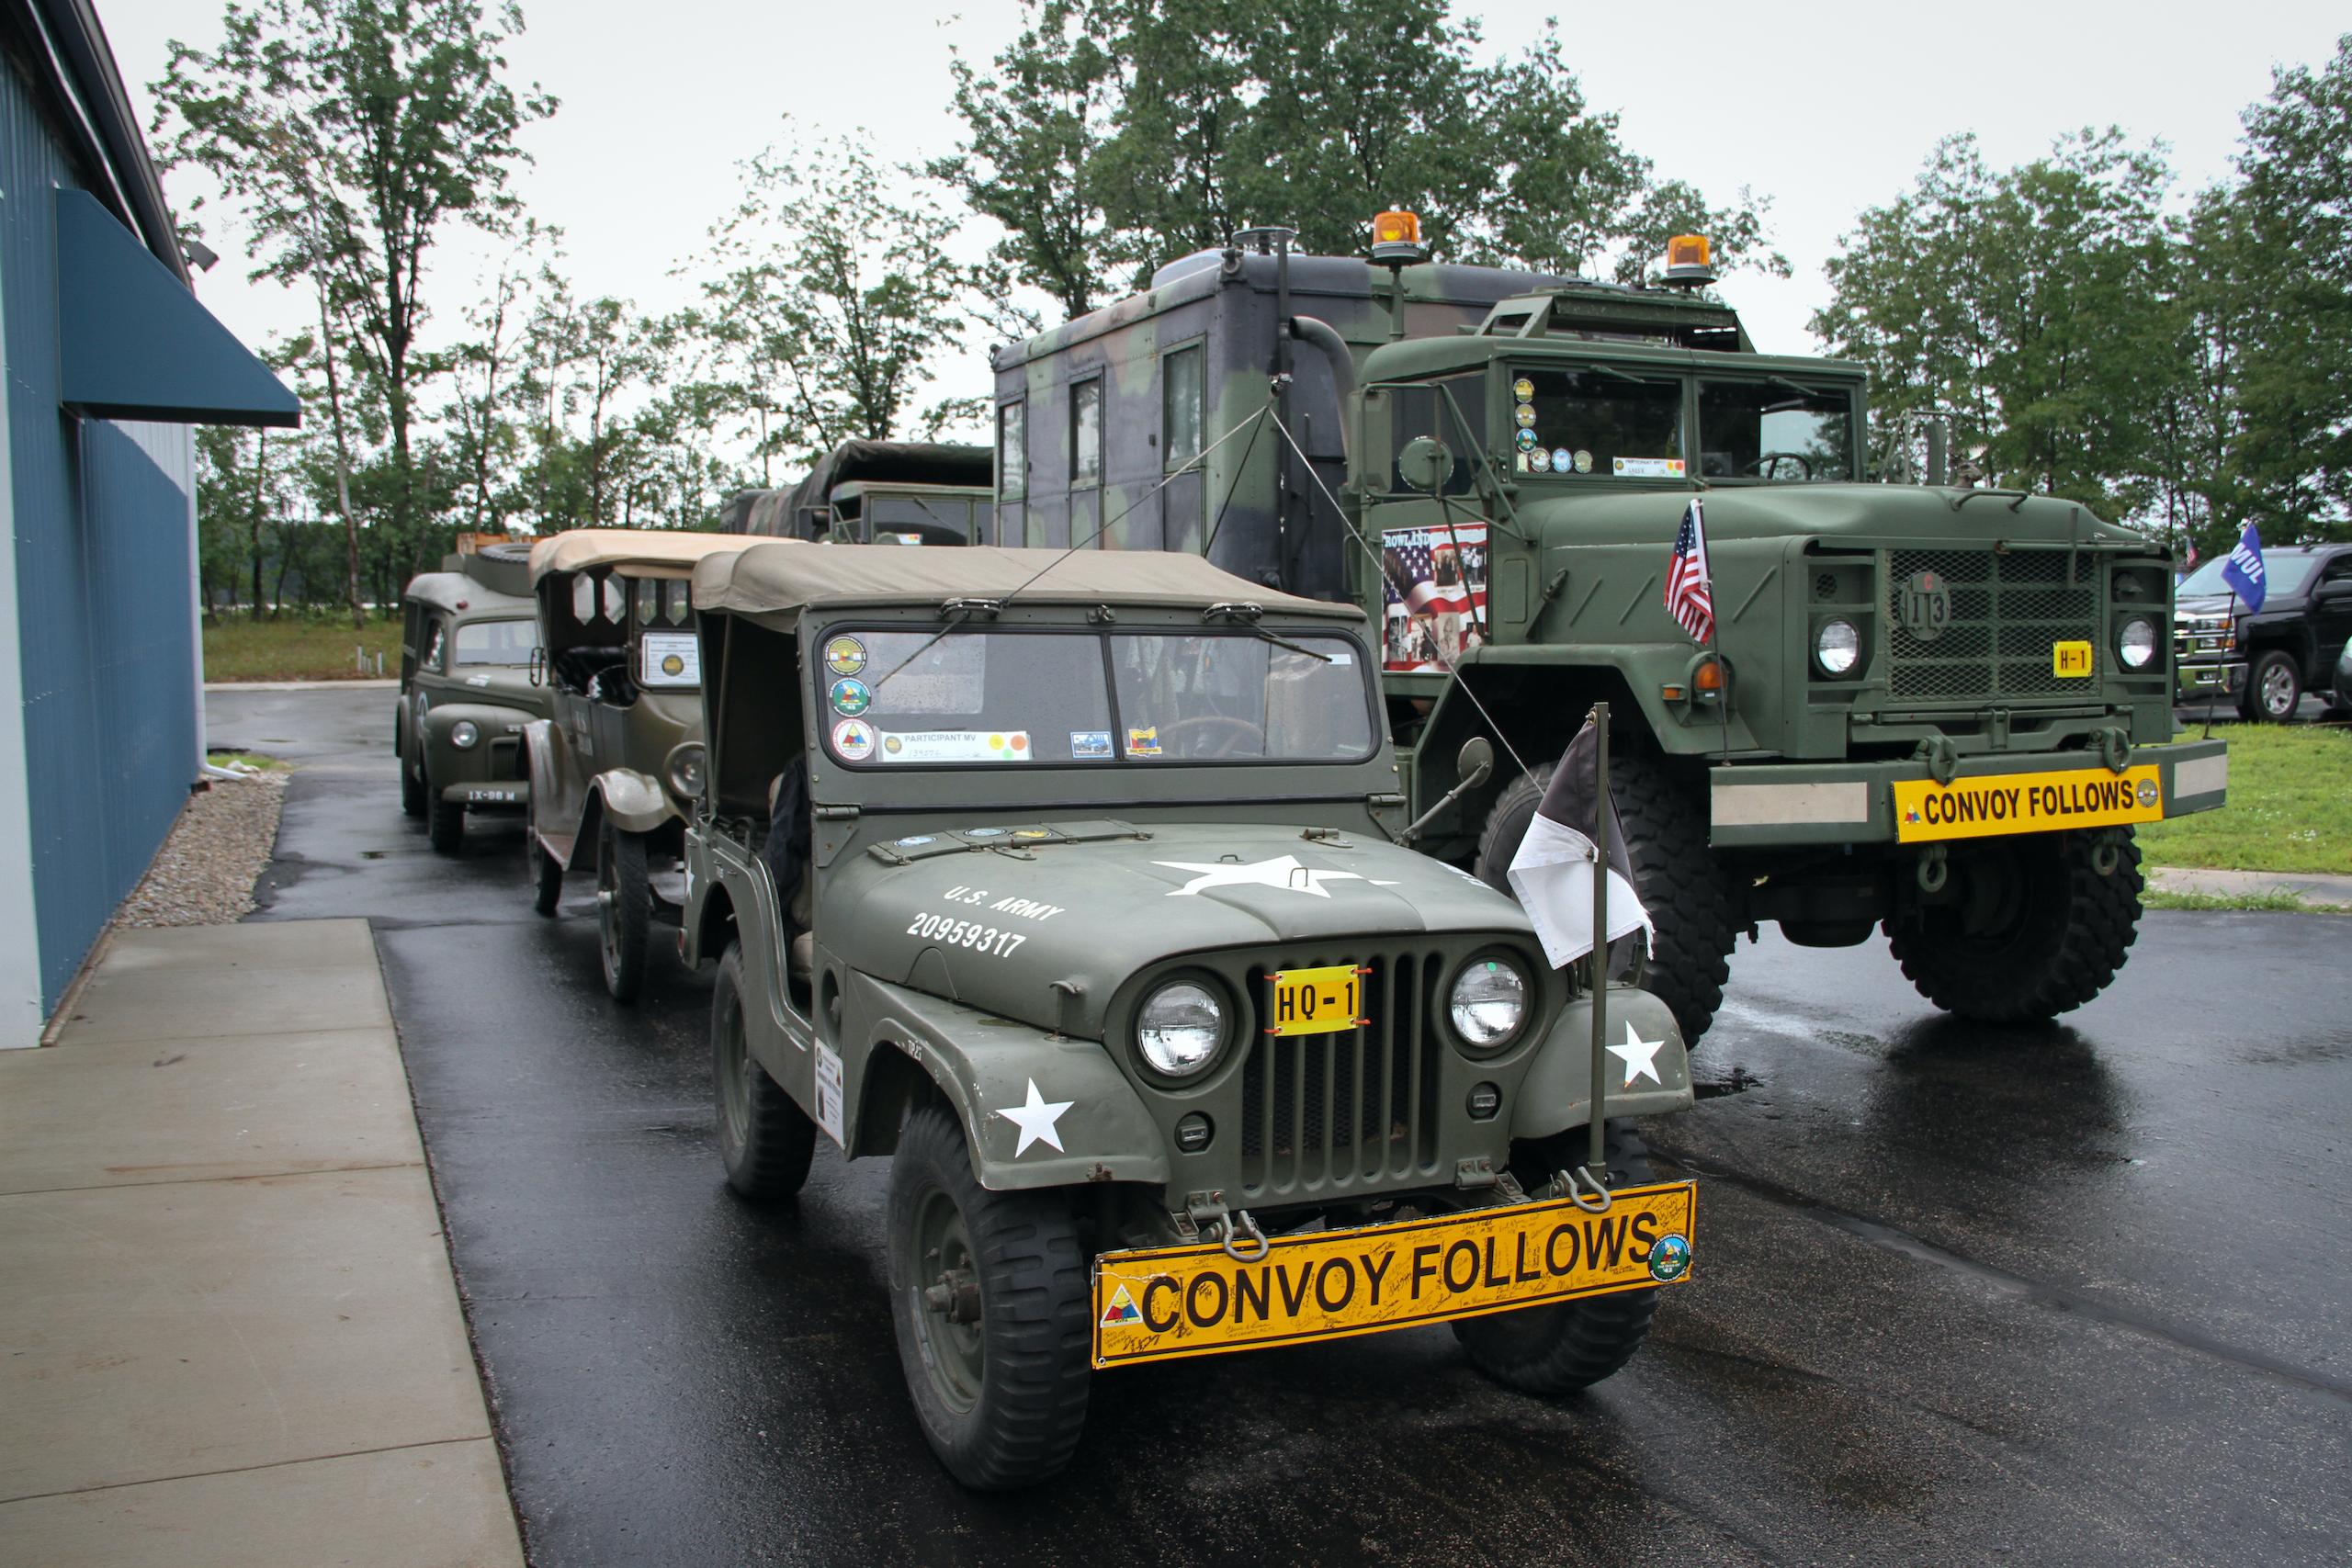 Military vehicle convoy vehicles